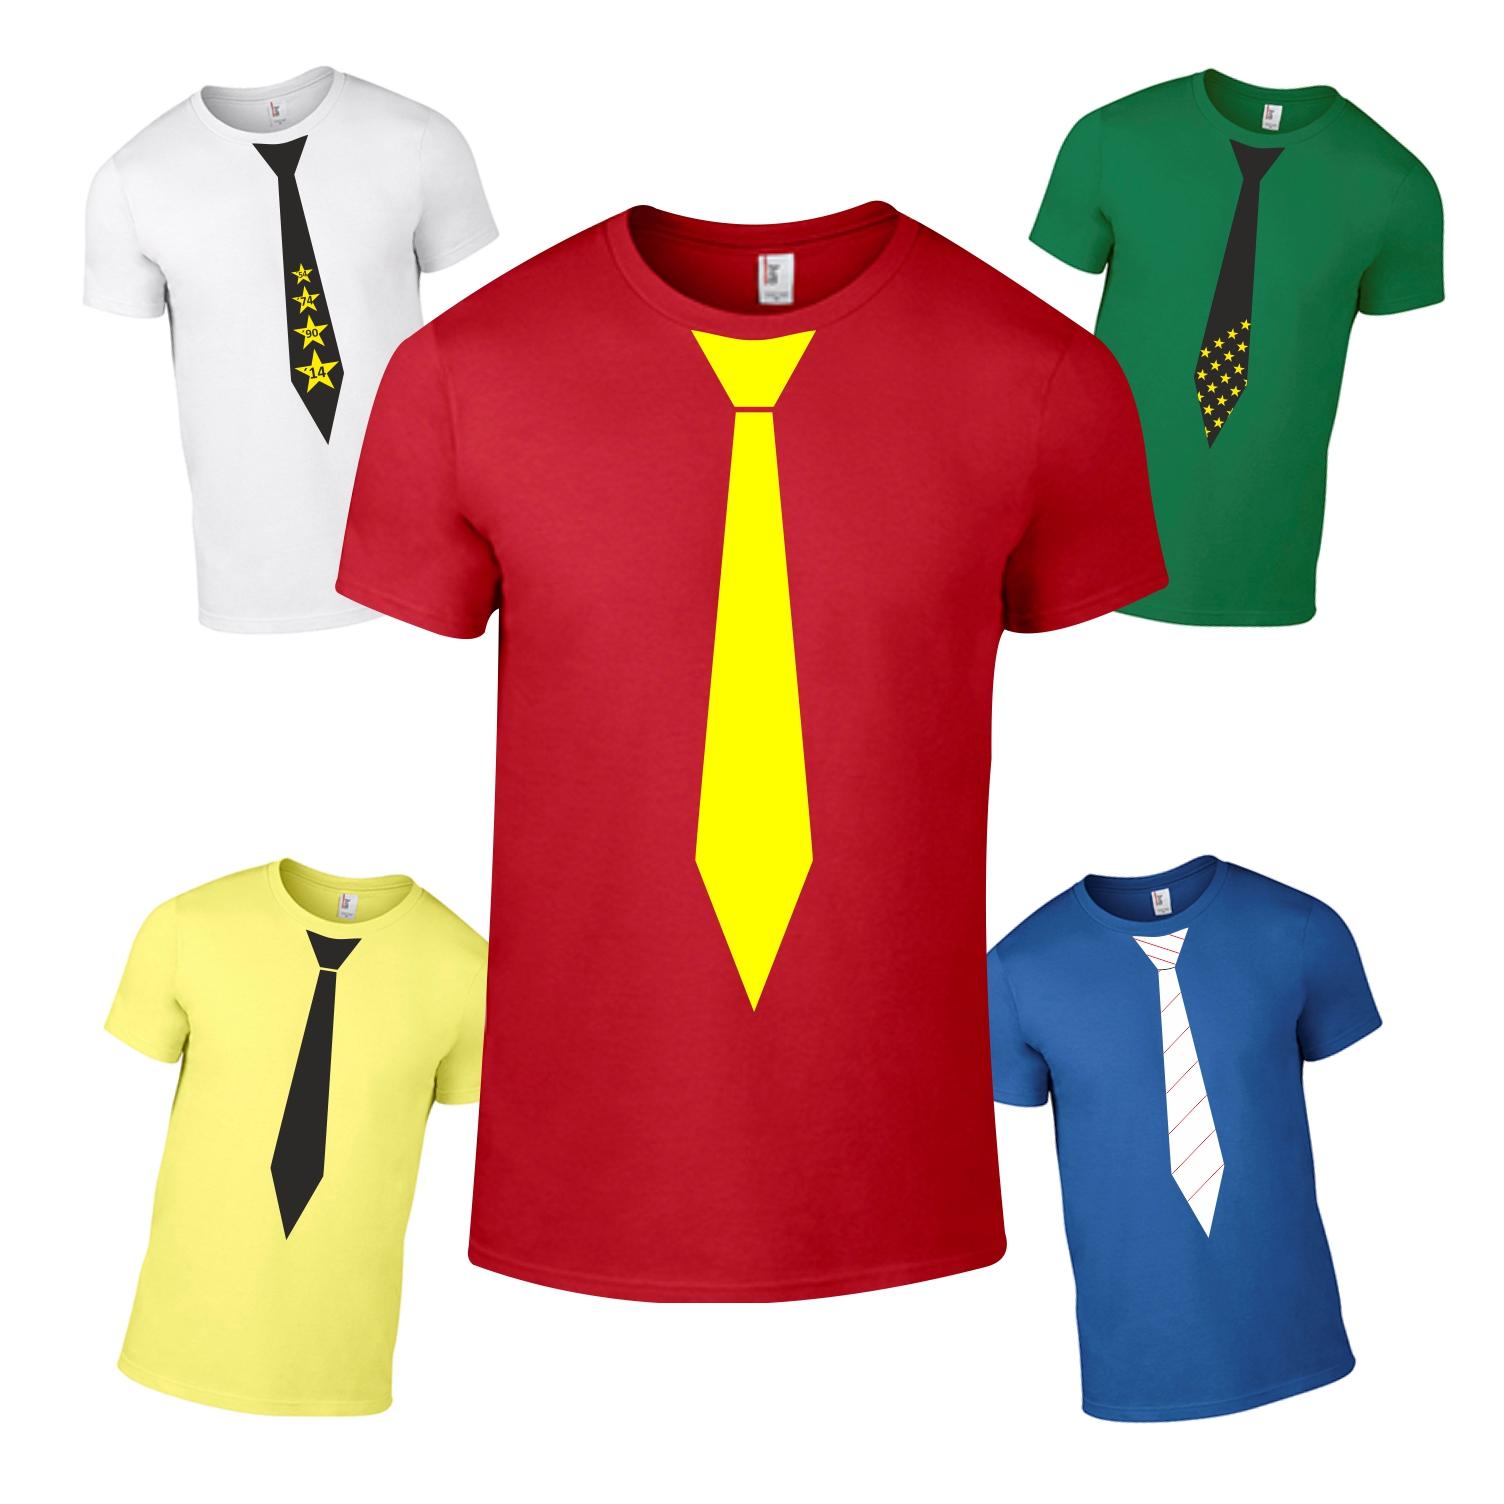 eigener t shirt online shop